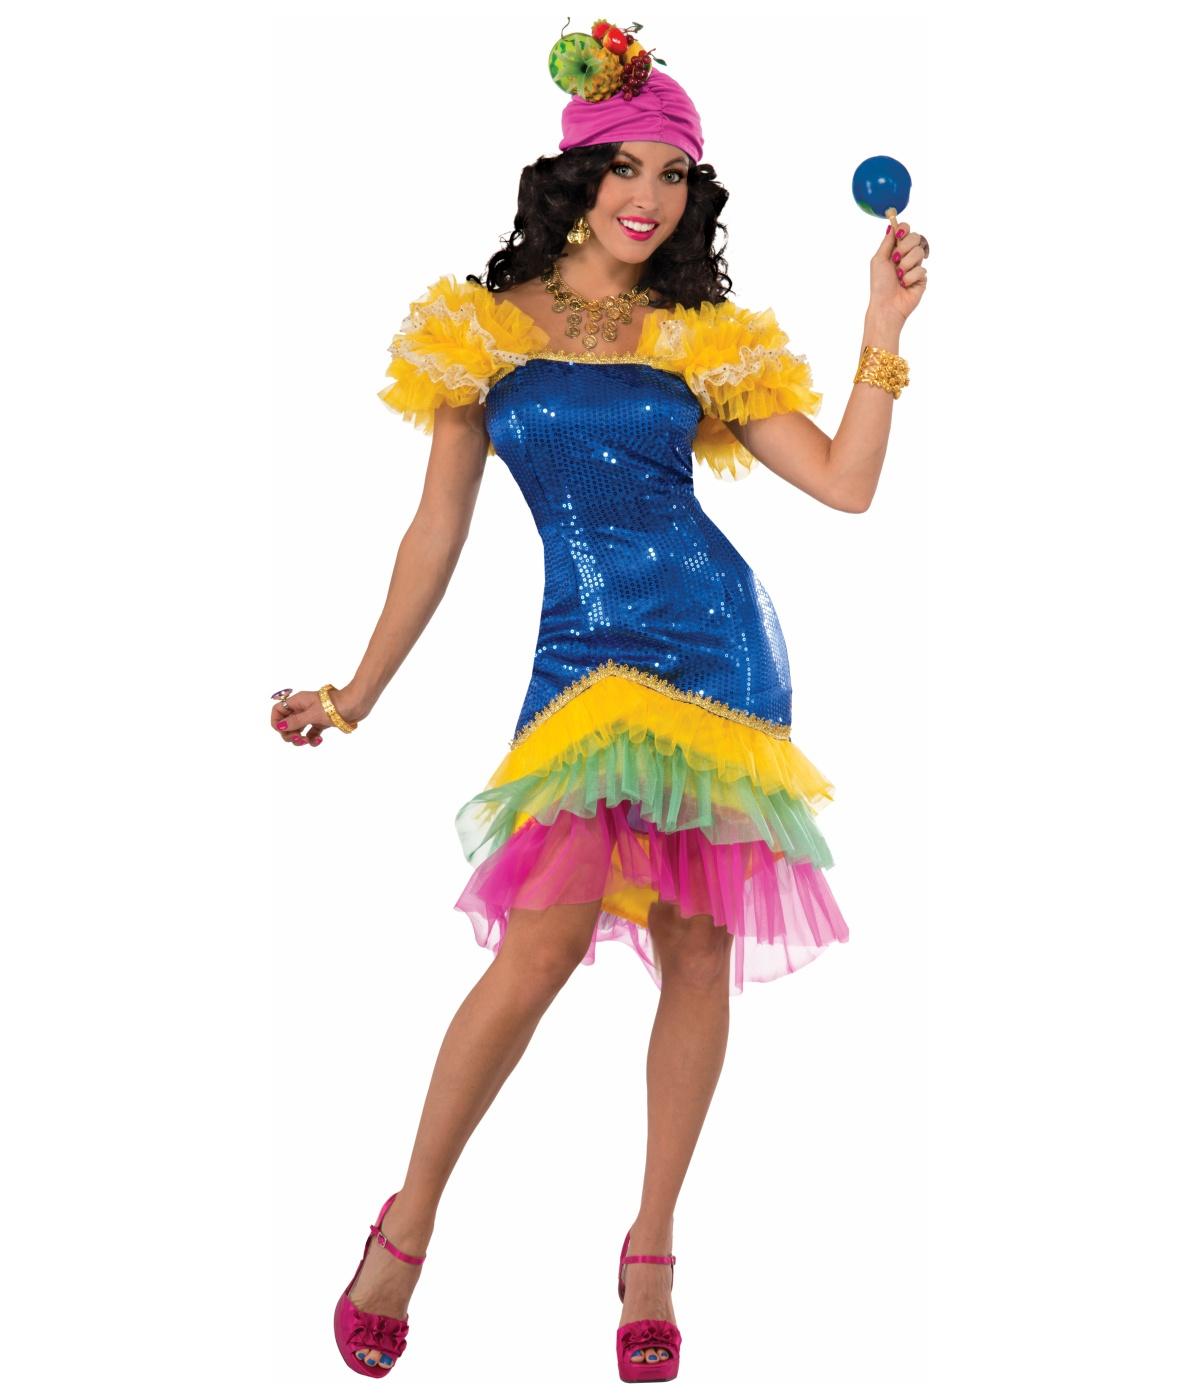 Pin dance costume spanish costume on pinterest